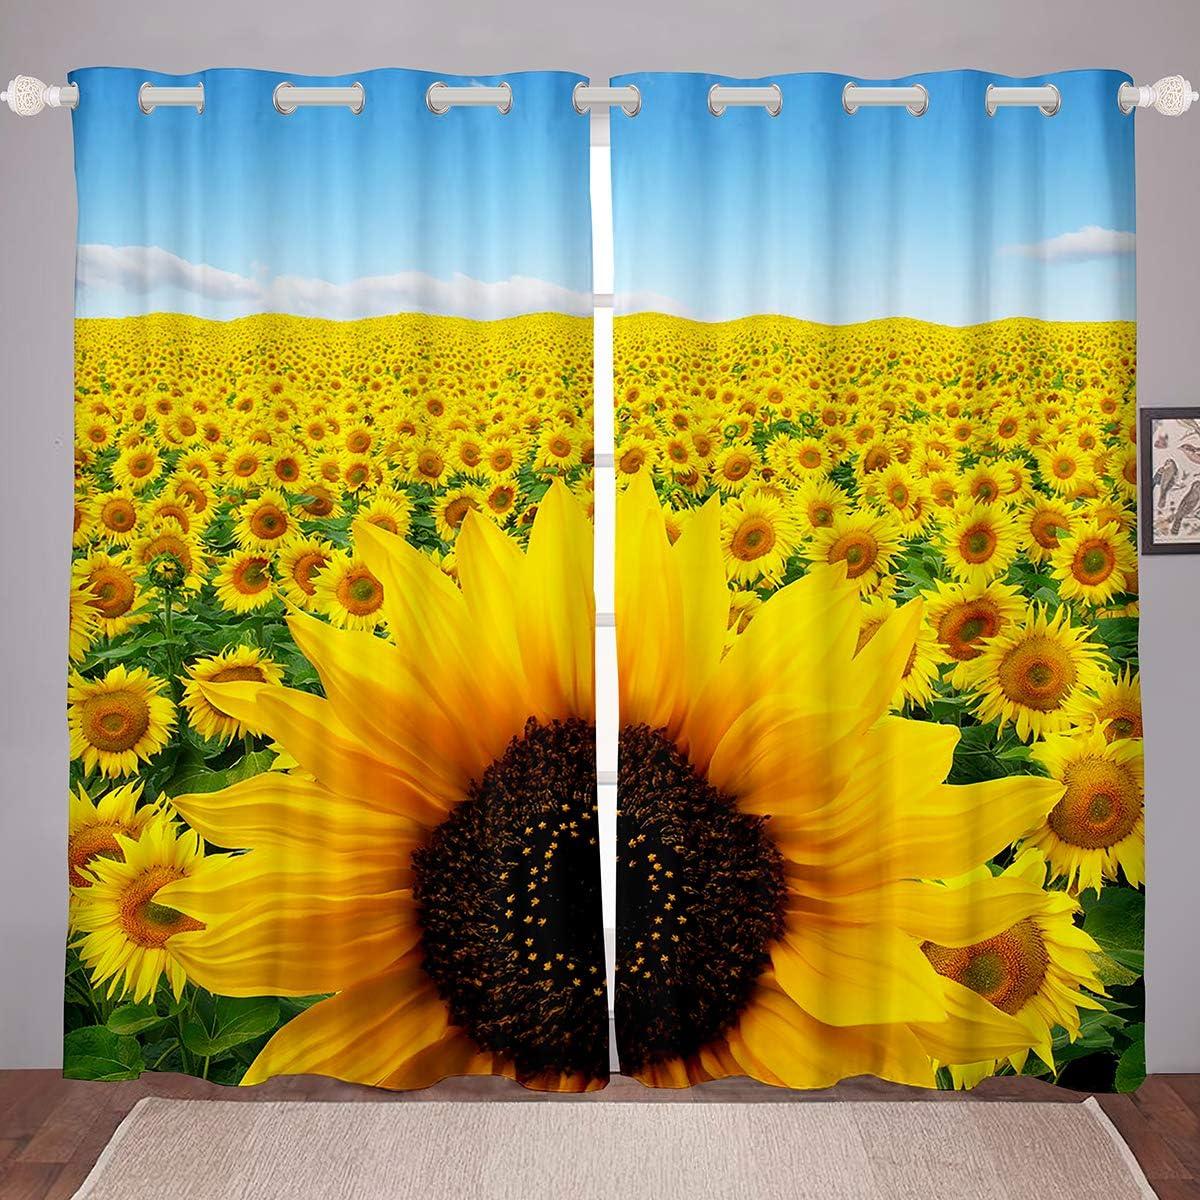 Erosebridal Girls Sunflower 着後レビューで 送料無料 Window Floral Curtains 百貨店 Curta Yellow